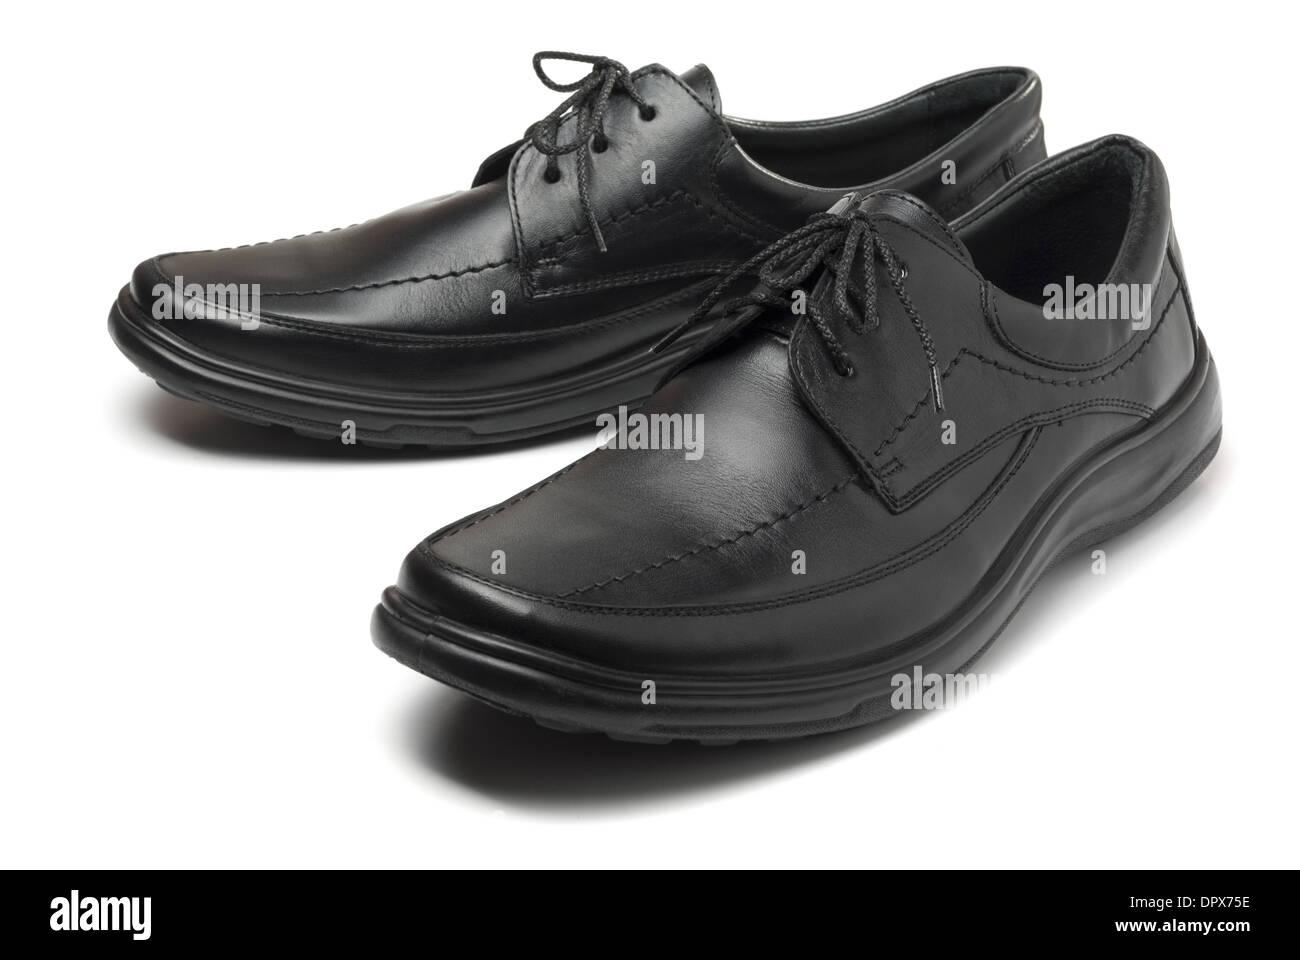 Paar schwarze Lederschuhe isoliert auf weiss mans Stockfoto